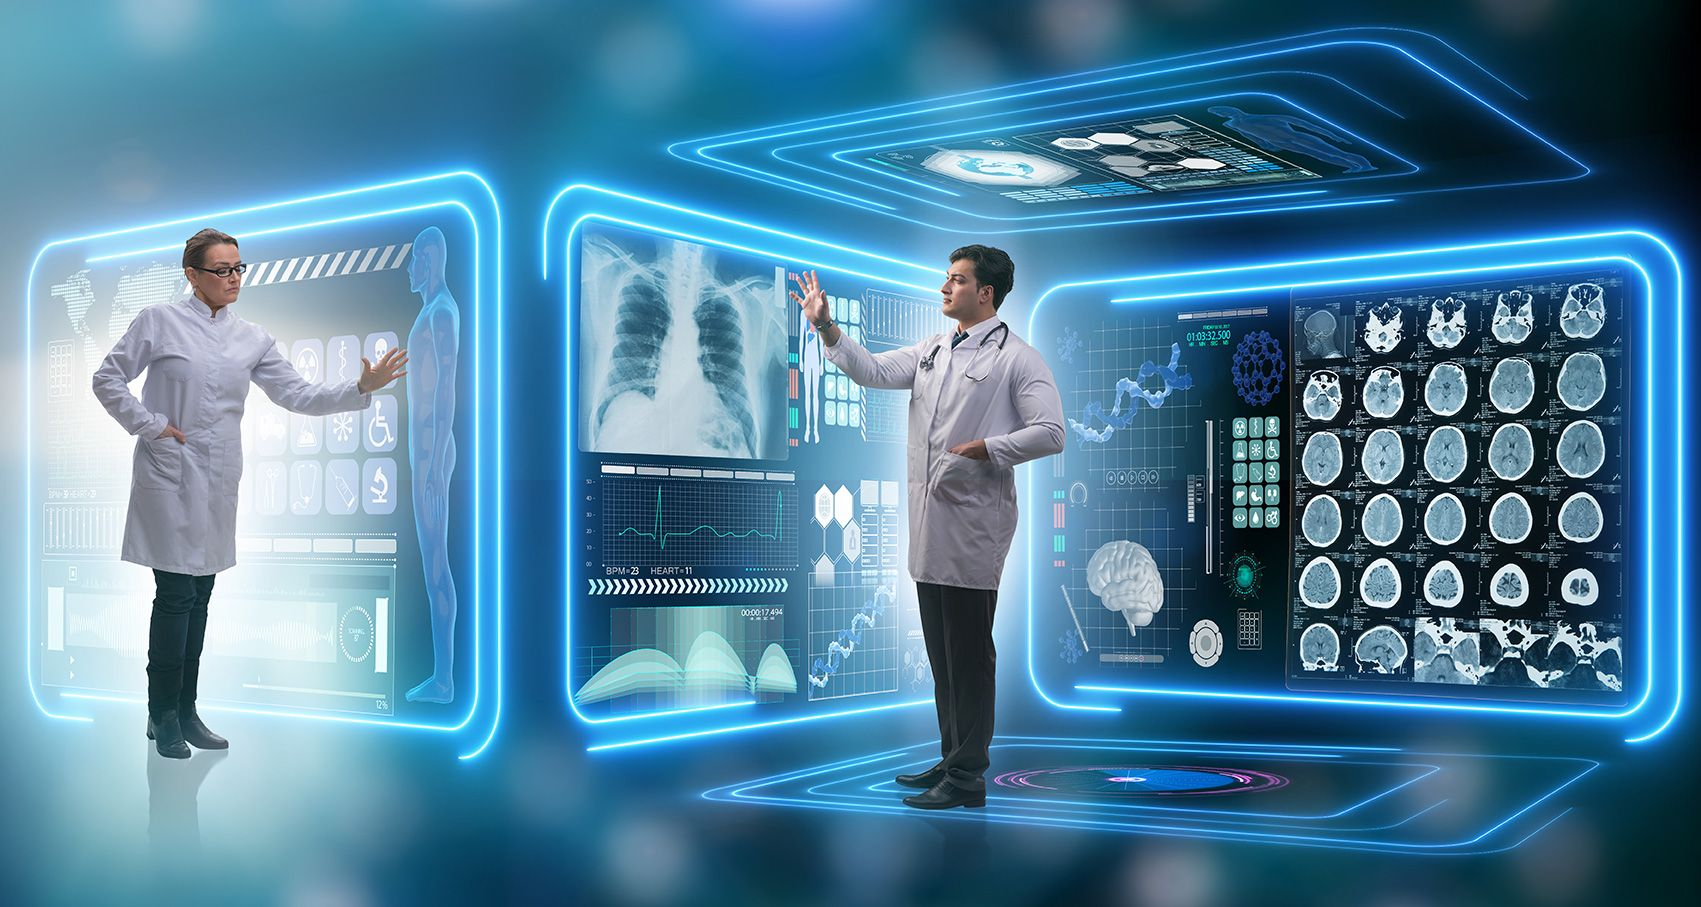 image featuring a futuristic look of telehealth and telemedicine